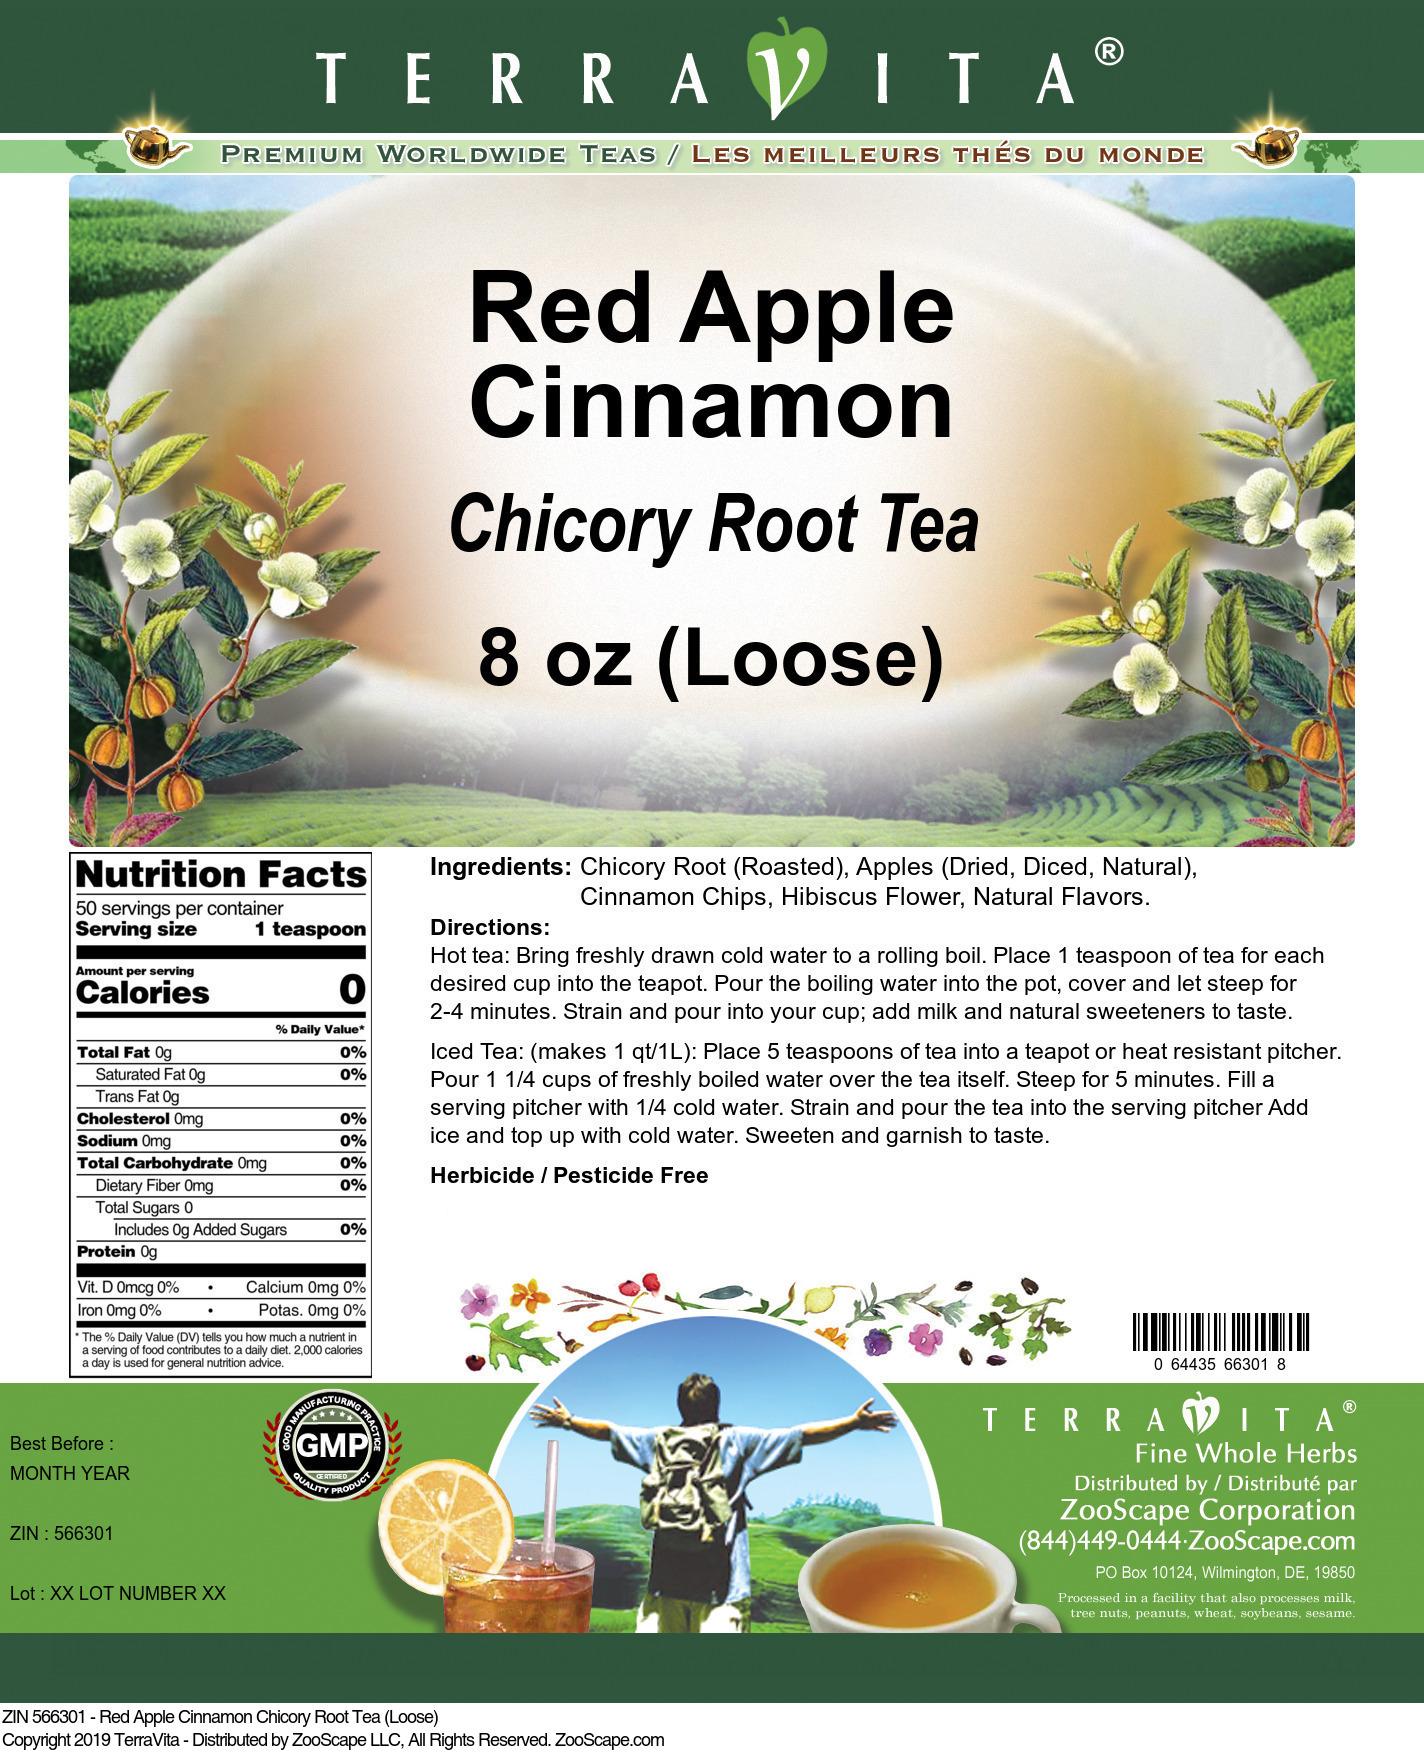 Red Apple Cinnamon Chicory Root